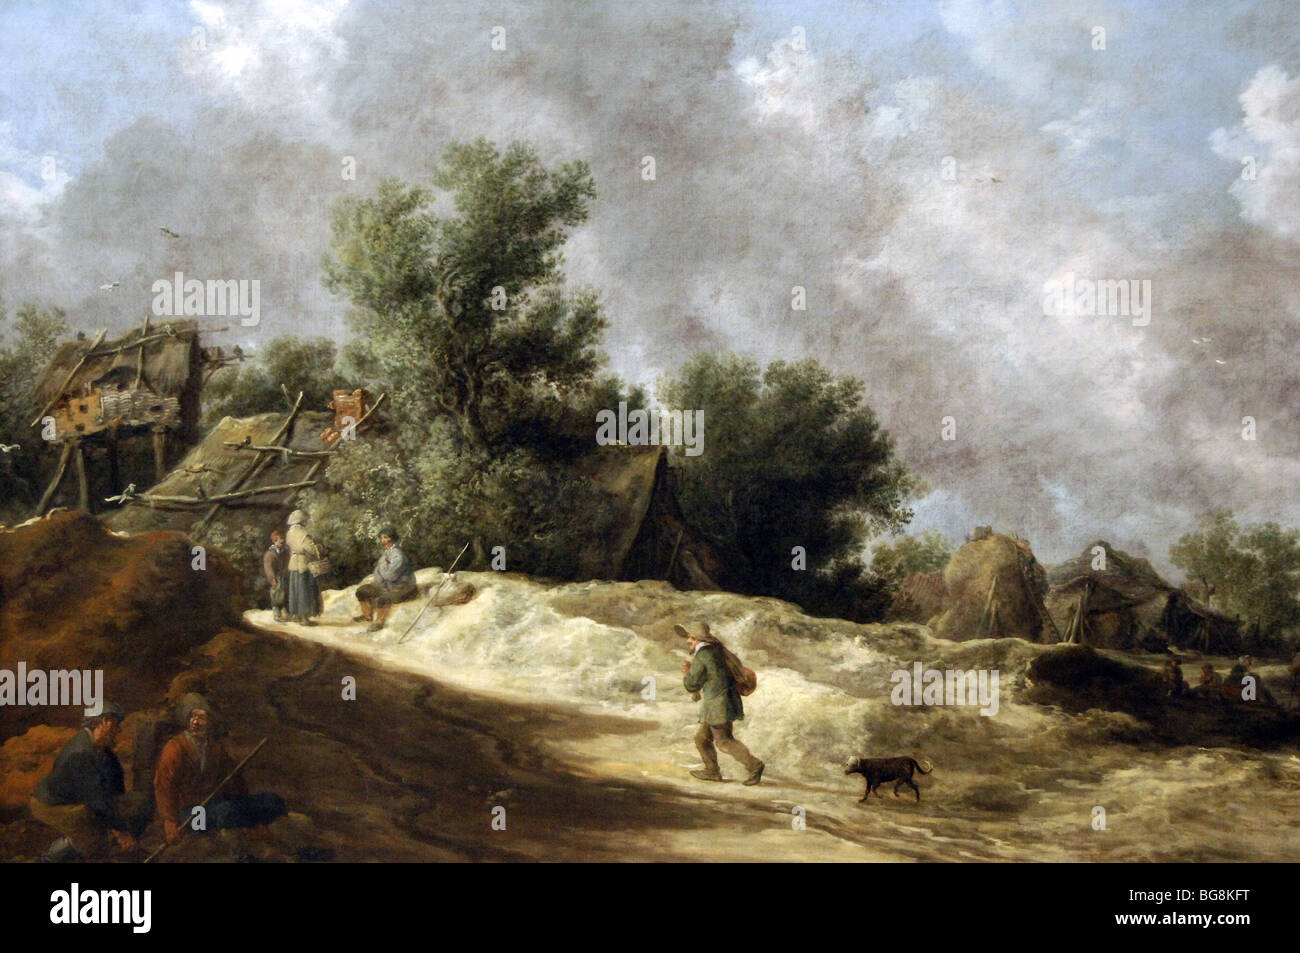 GOYEN, Jan Van (1596-1656). Dutchman painter. Outskirts of a village with travelers, 1630. - Stock Image